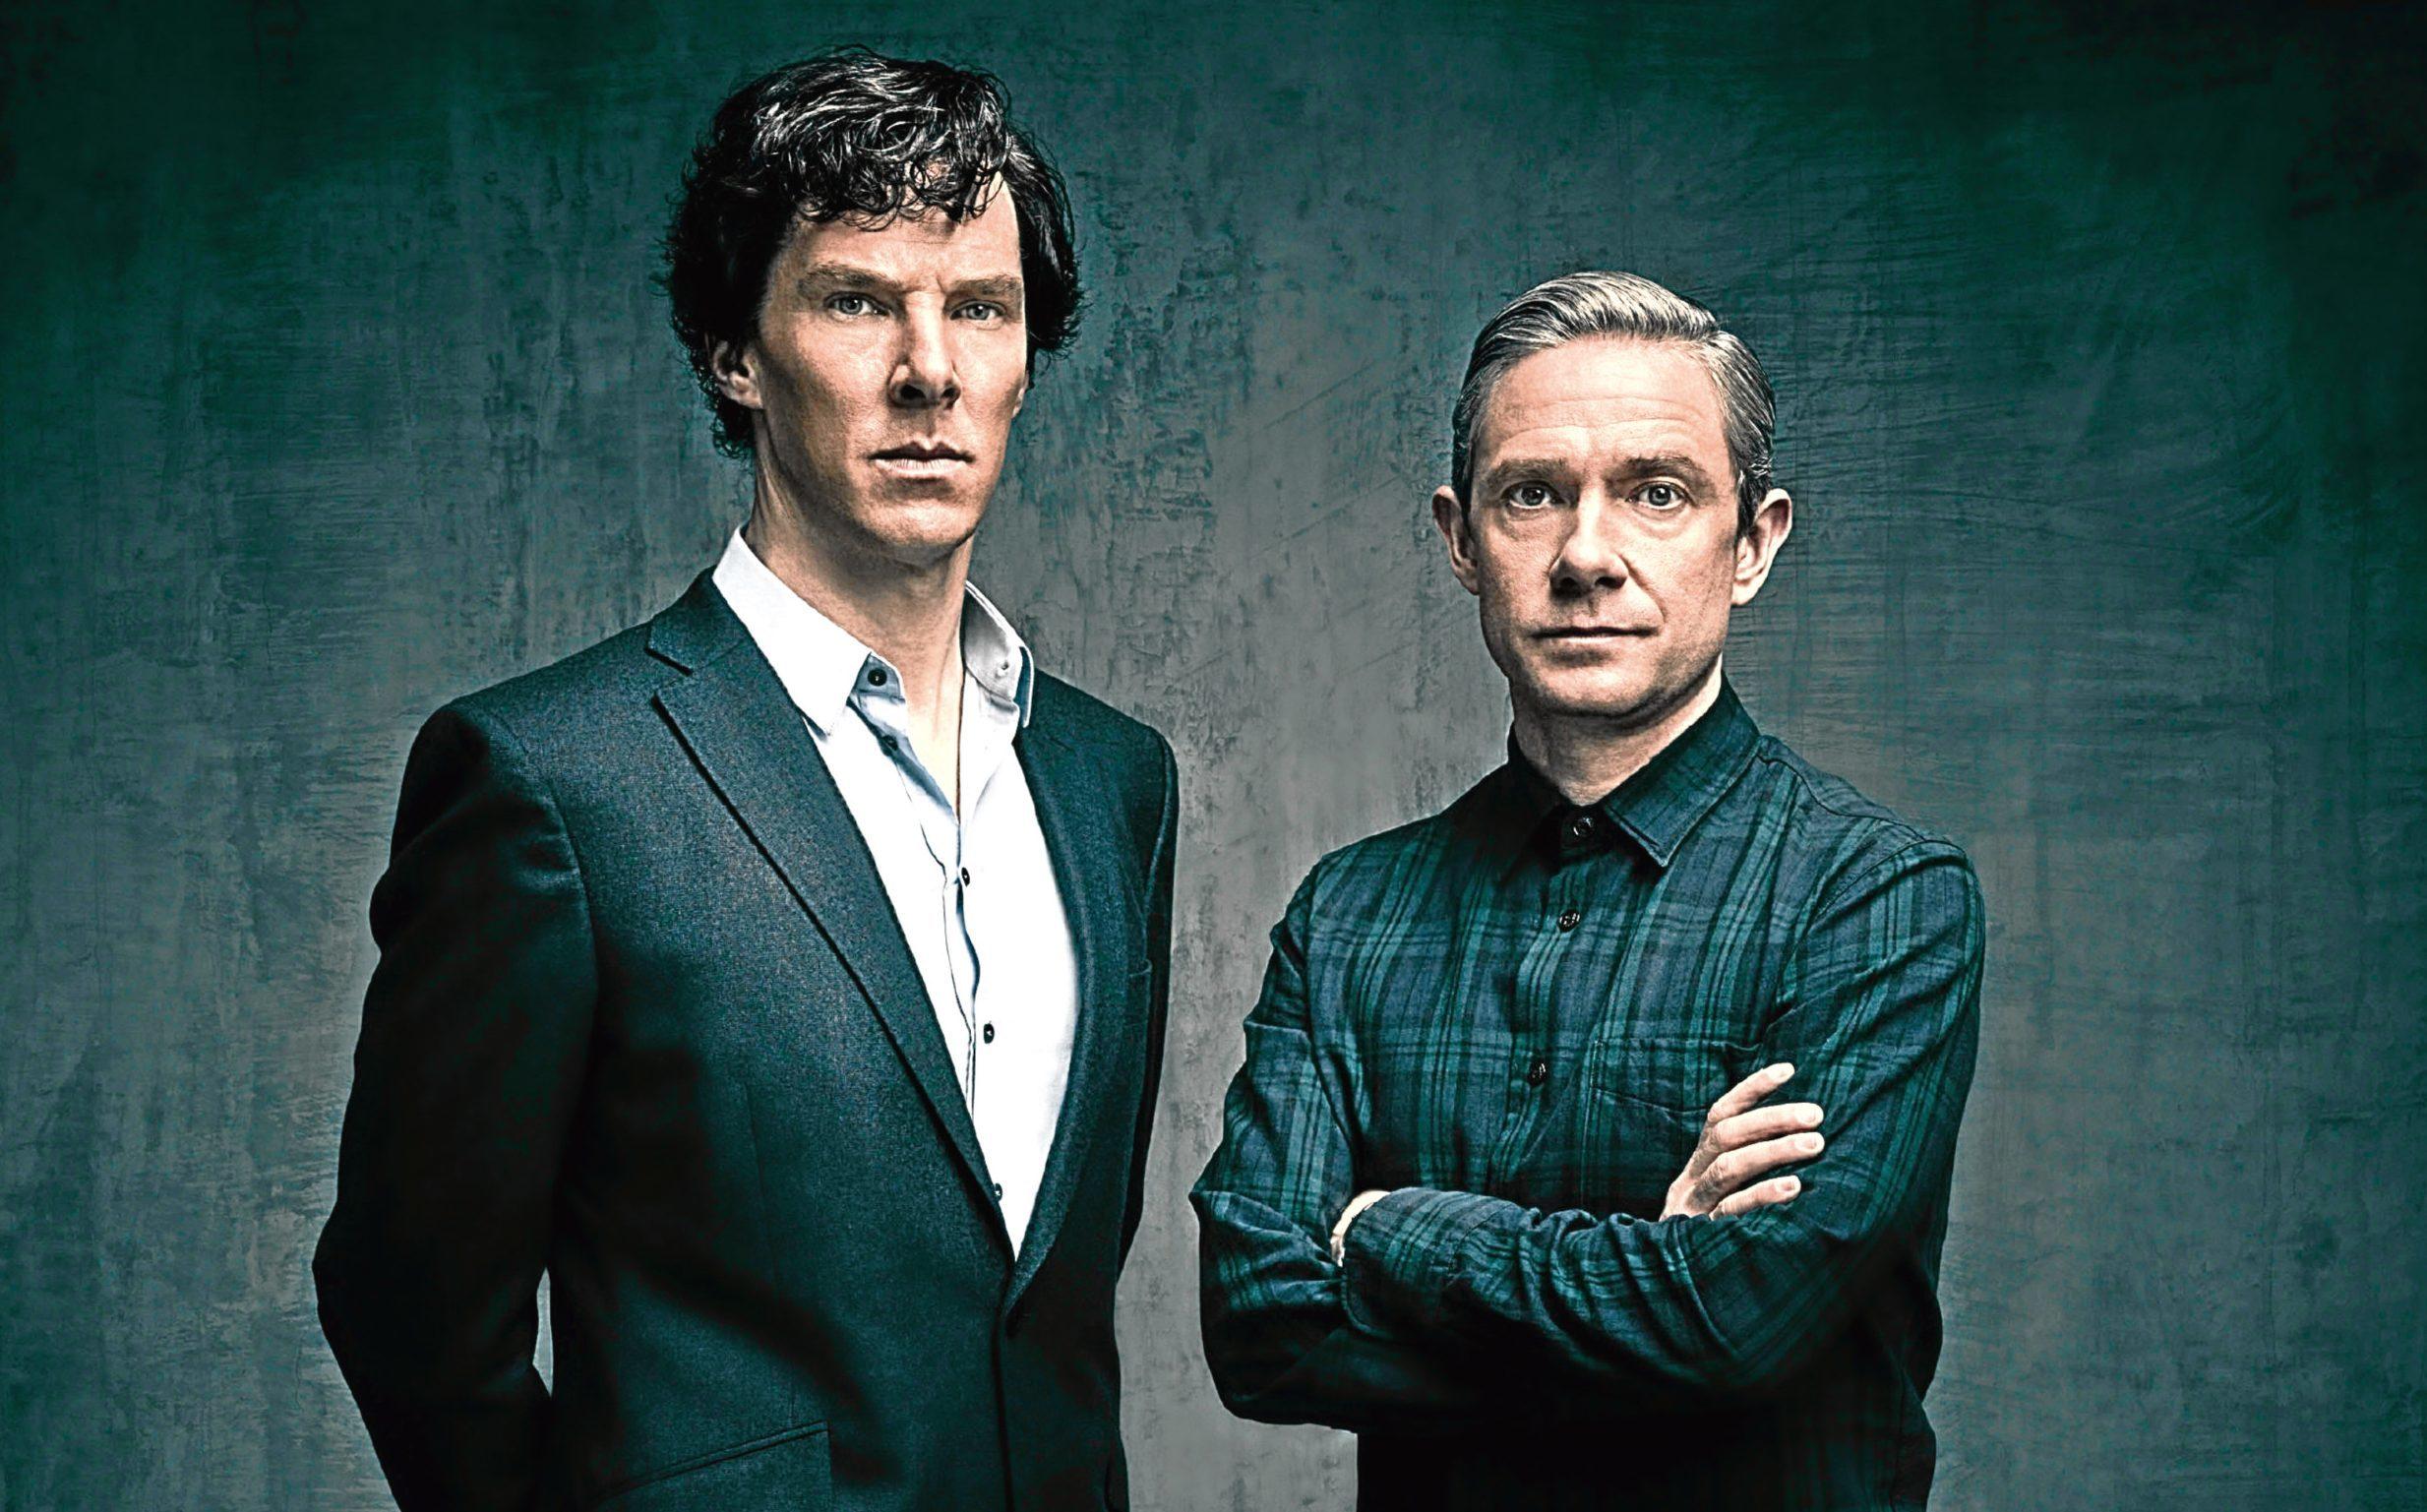 Benedict Cumberbatch and Martin Freeman in Sherlock (Hartswood Films / Todd Antony)